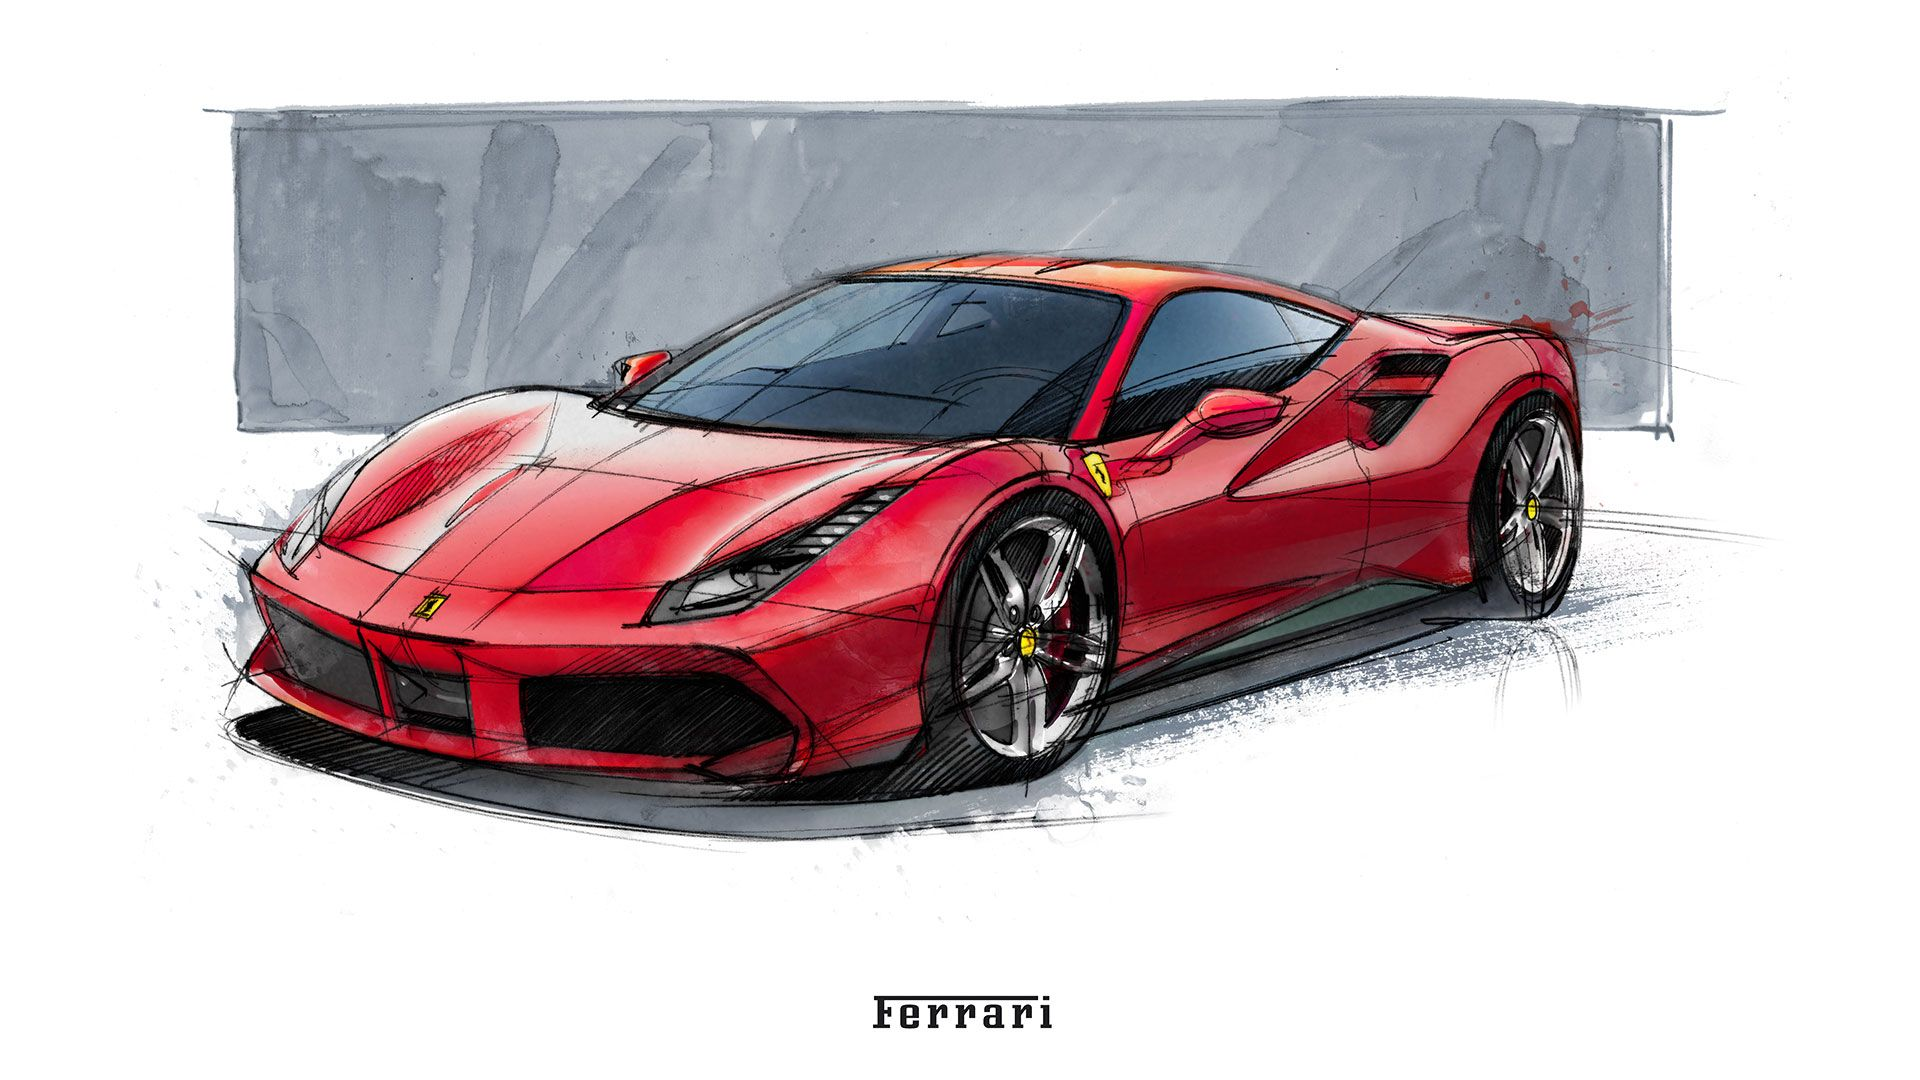 Ferrari 488 Gtb Extreme Performance For Extreme Emotions Car Drawings Concept Car Design Ferrari 488